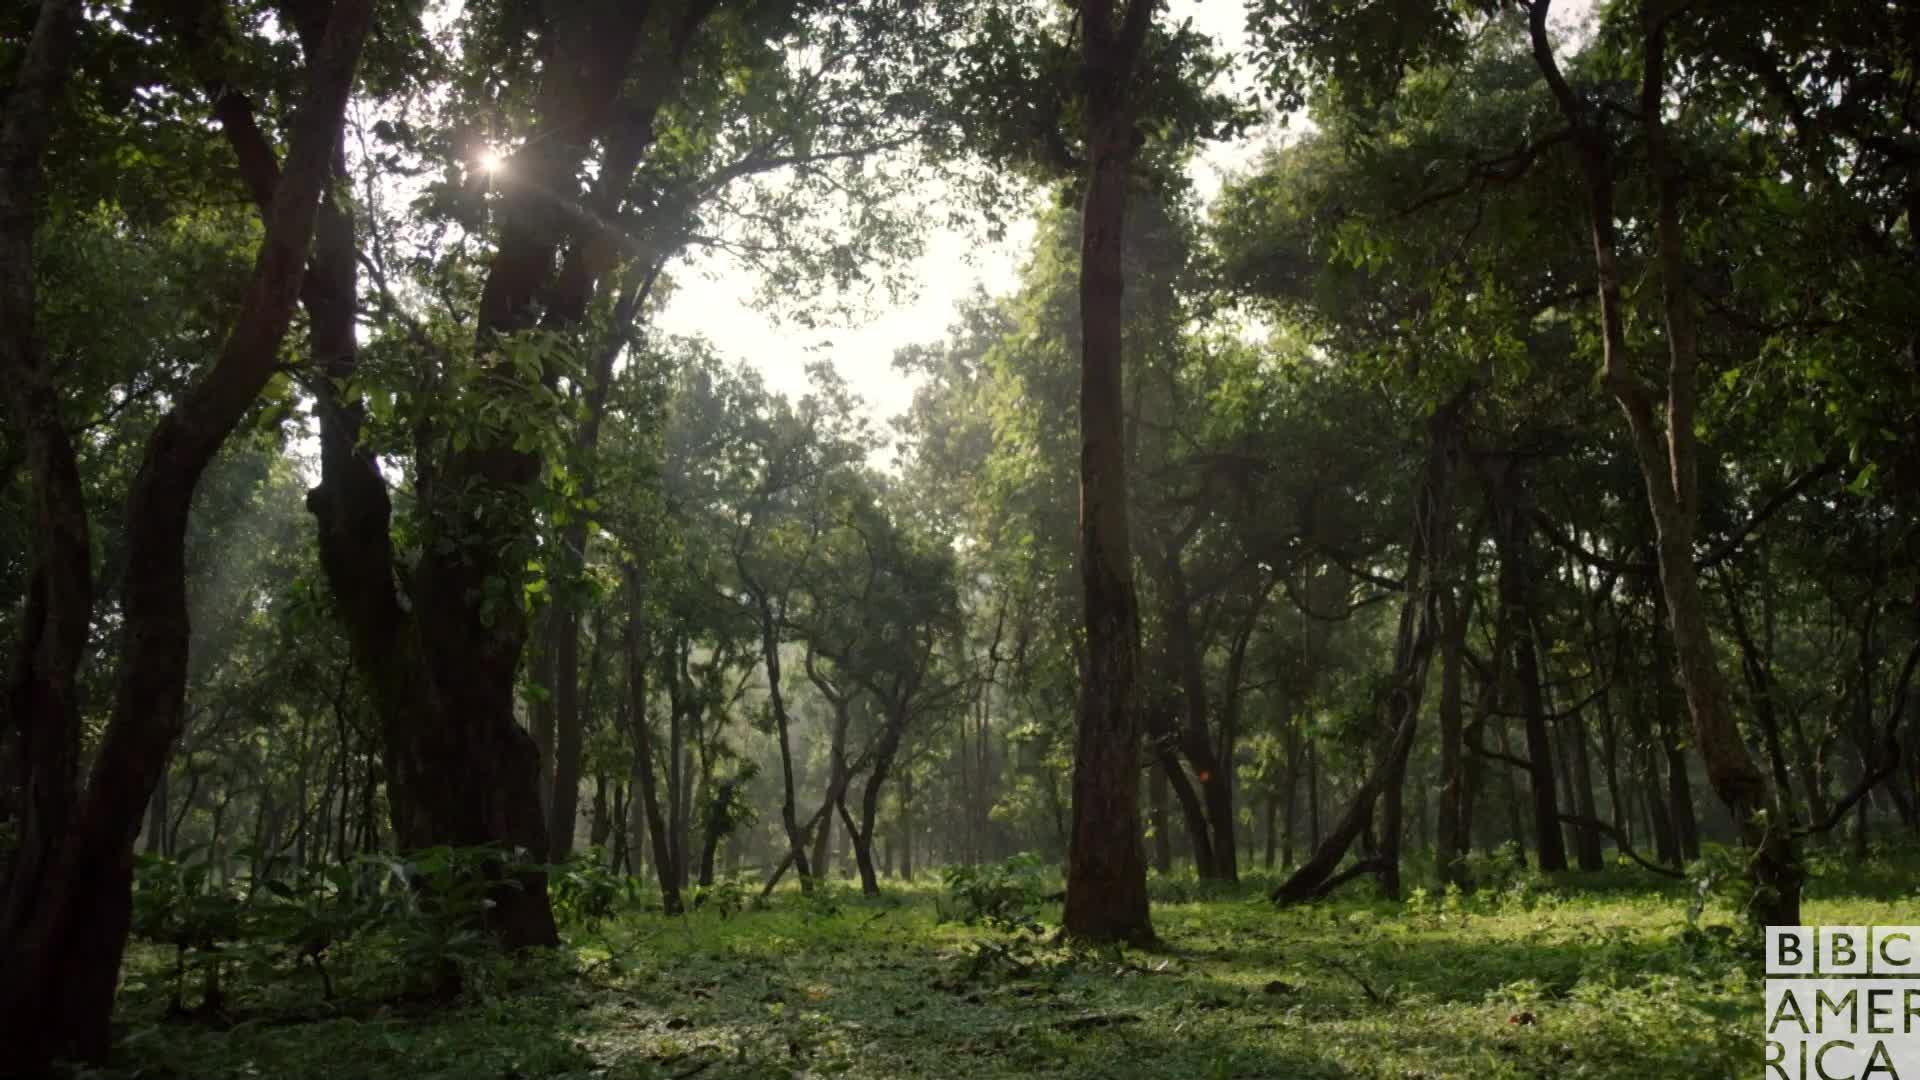 animal, animals, bbc america, bbc america dynasties, bbc america: dynasties, dynasties, nature, Dynasties Tiger Forest GIFs